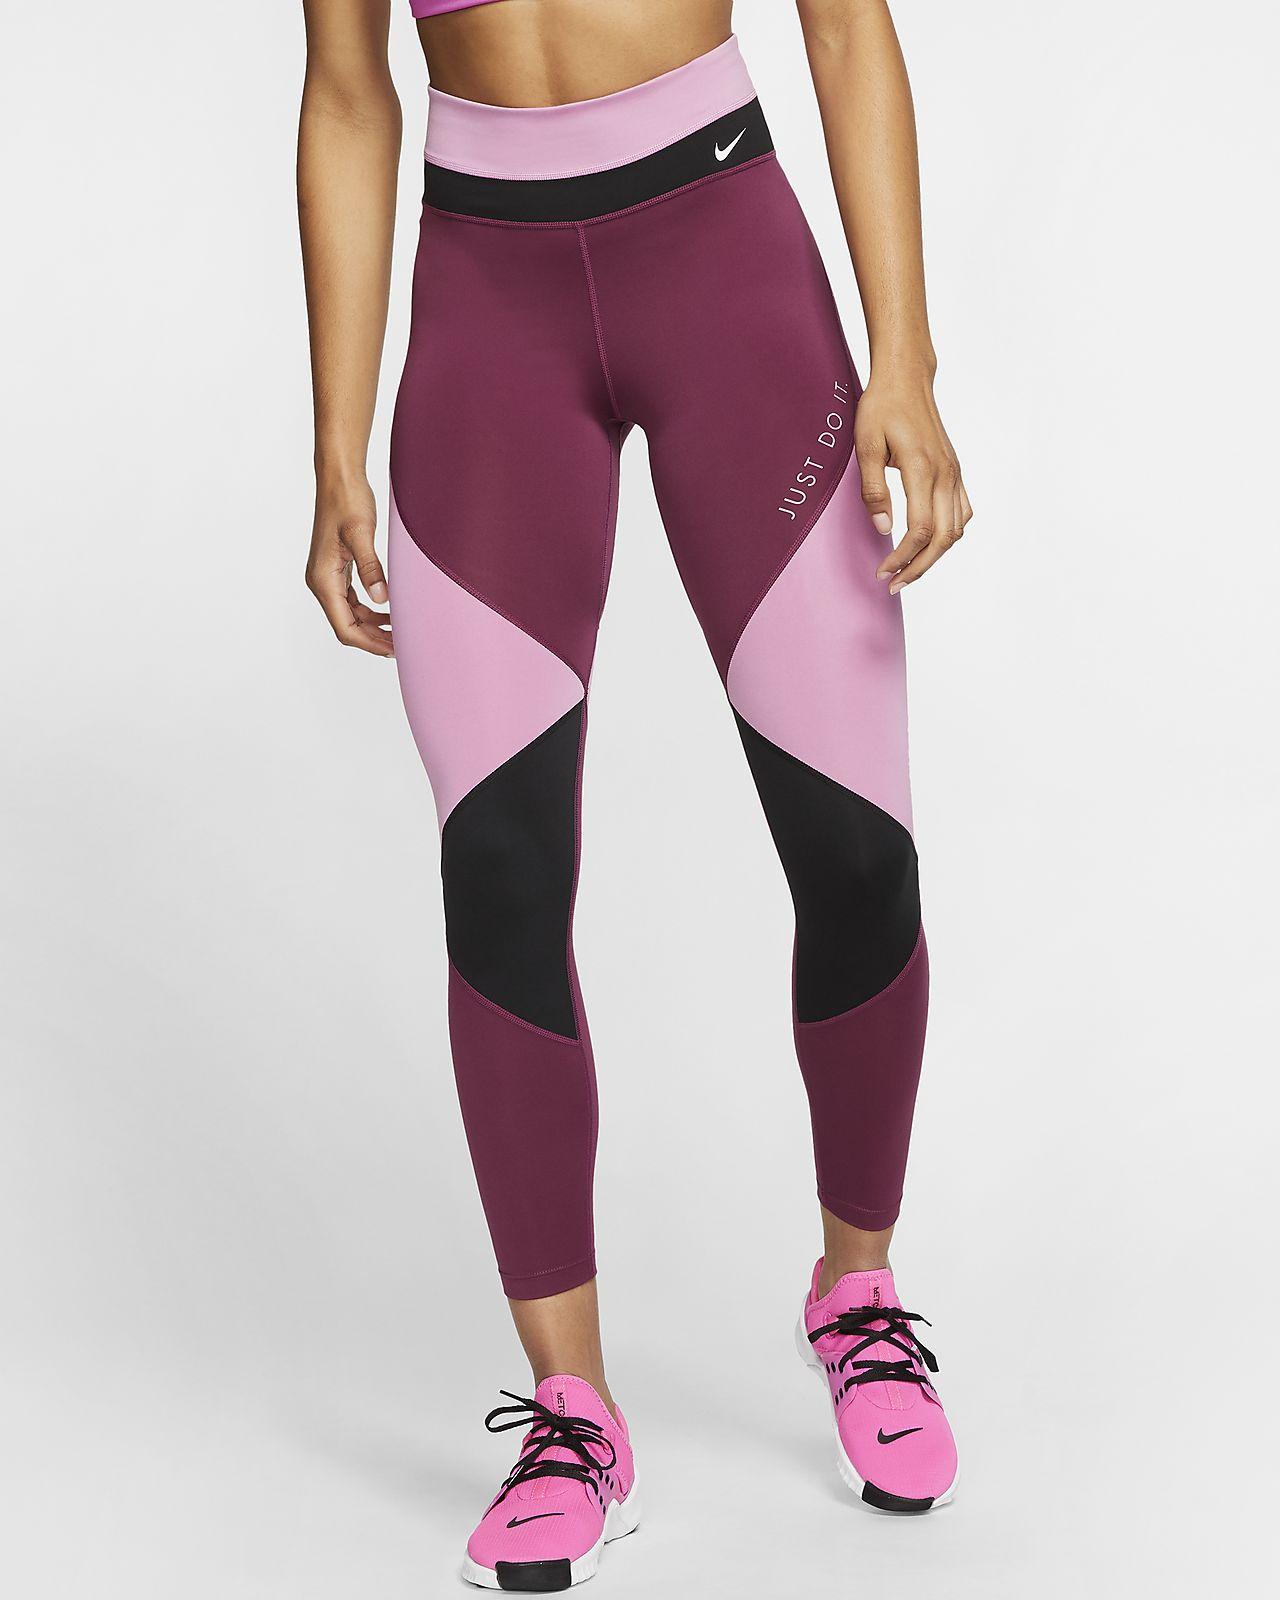 Legging 78 Nike One pour Femme